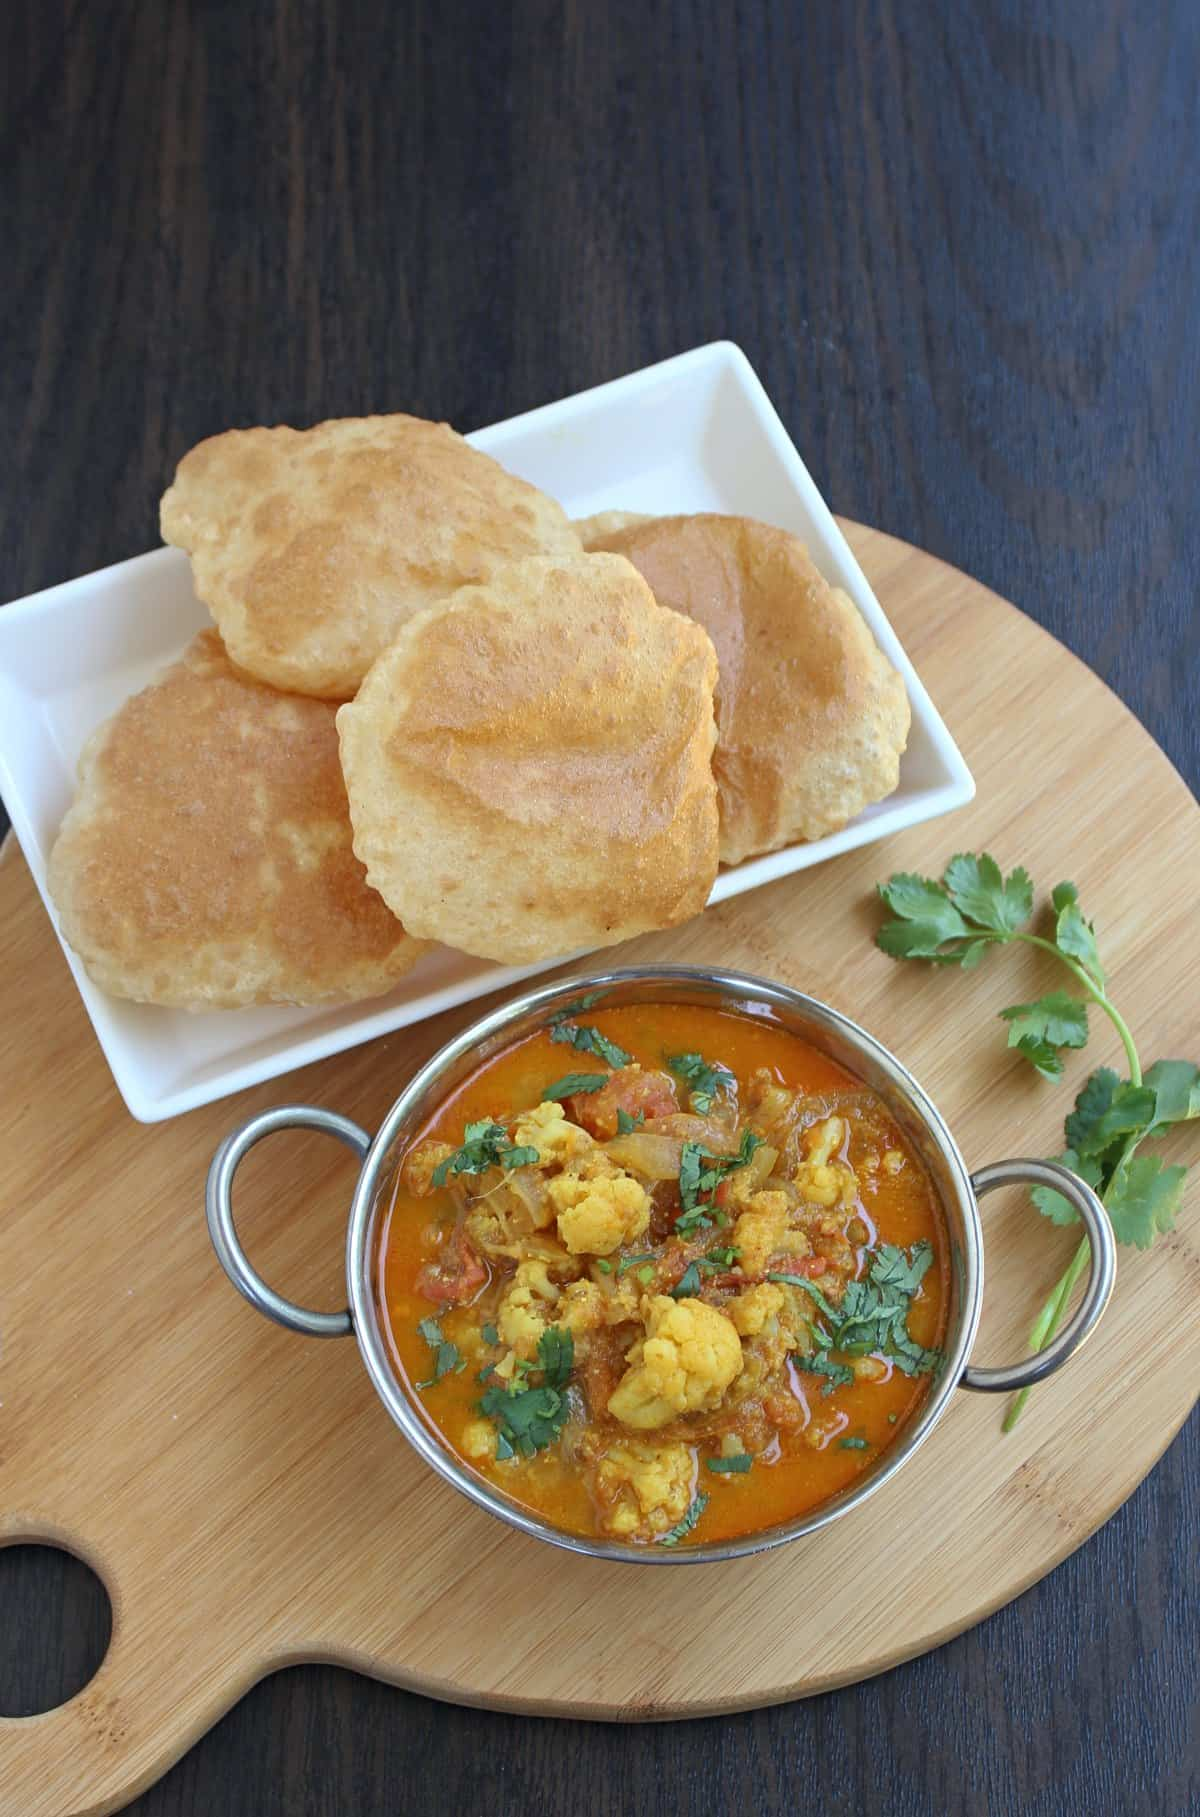 Cauliflower curry / subzi in a bowl with poori